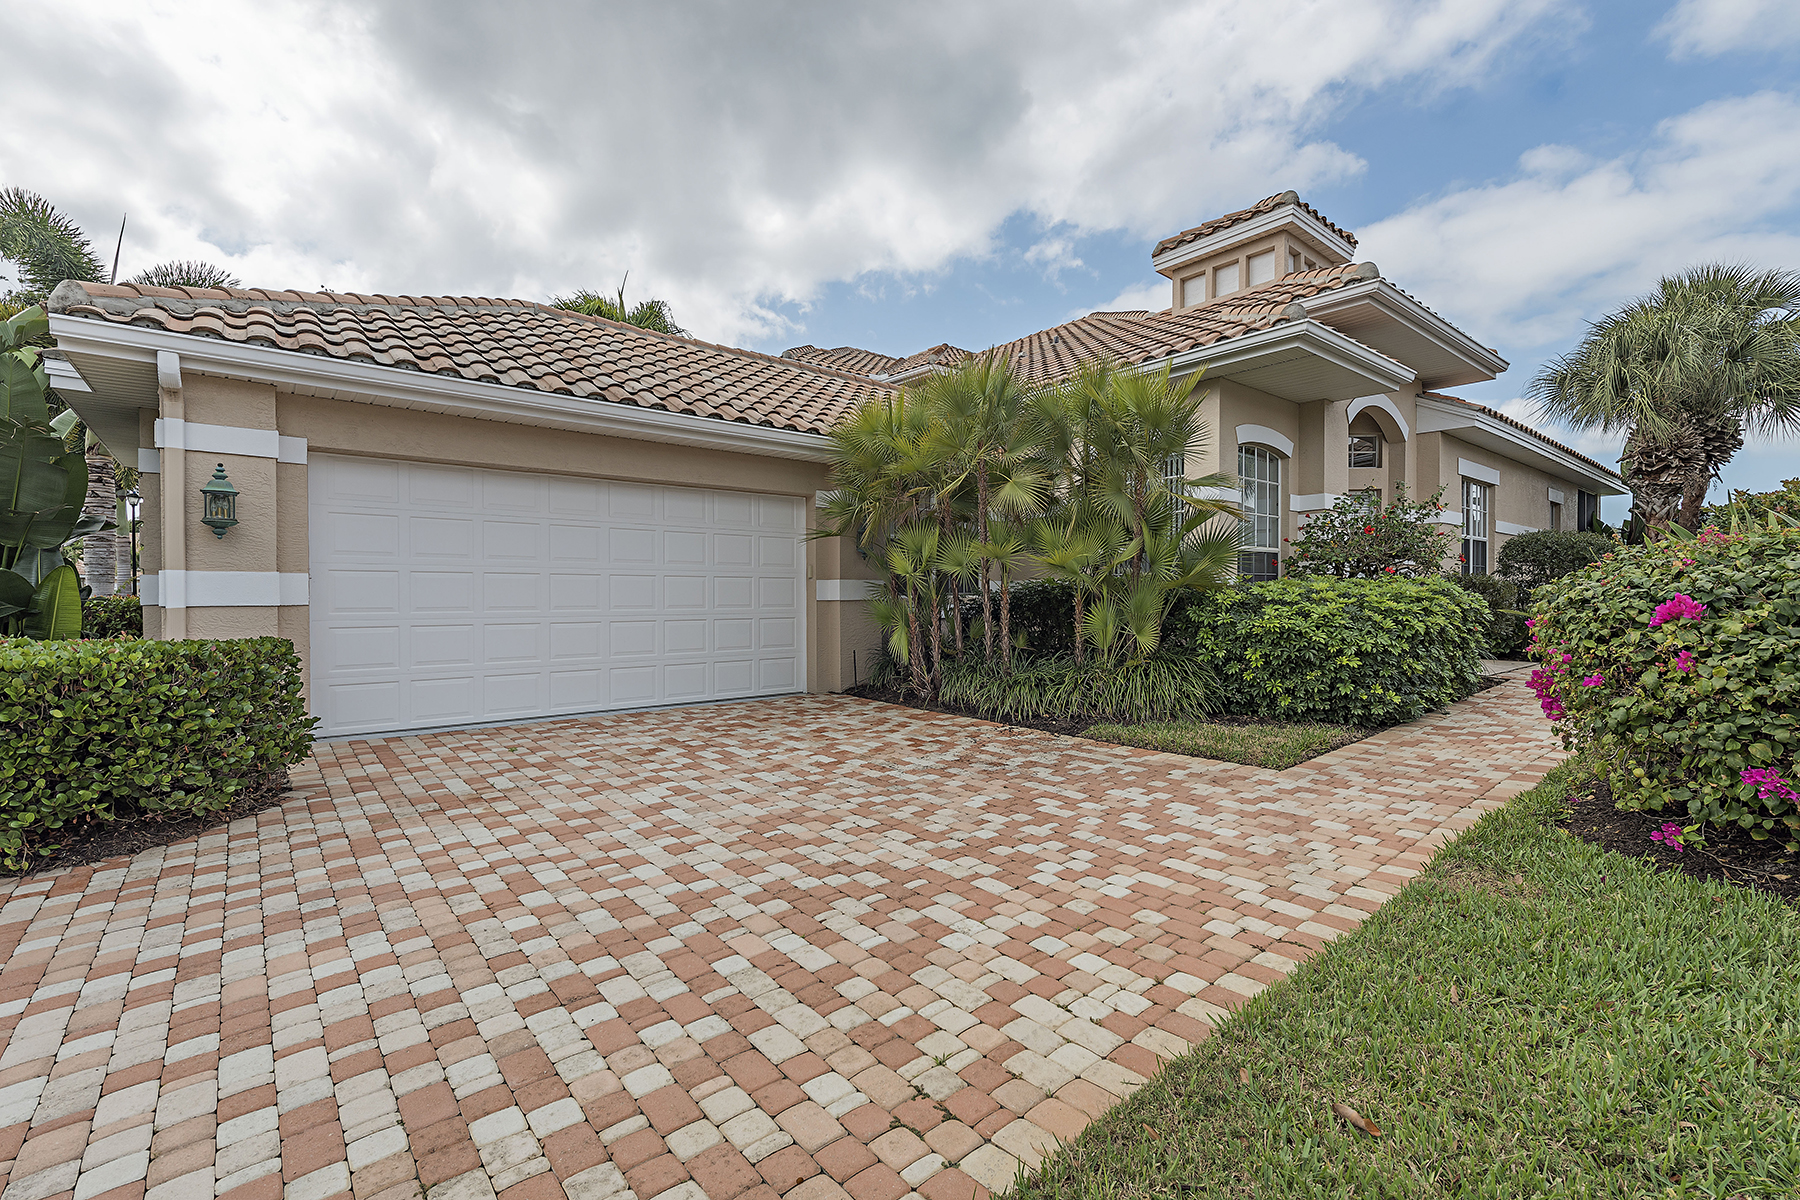 Townhouse for Sale at PELICAN LANDING - BAYCREST 25240 Galashields Cir, Bonita Springs, Florida 34134 United States